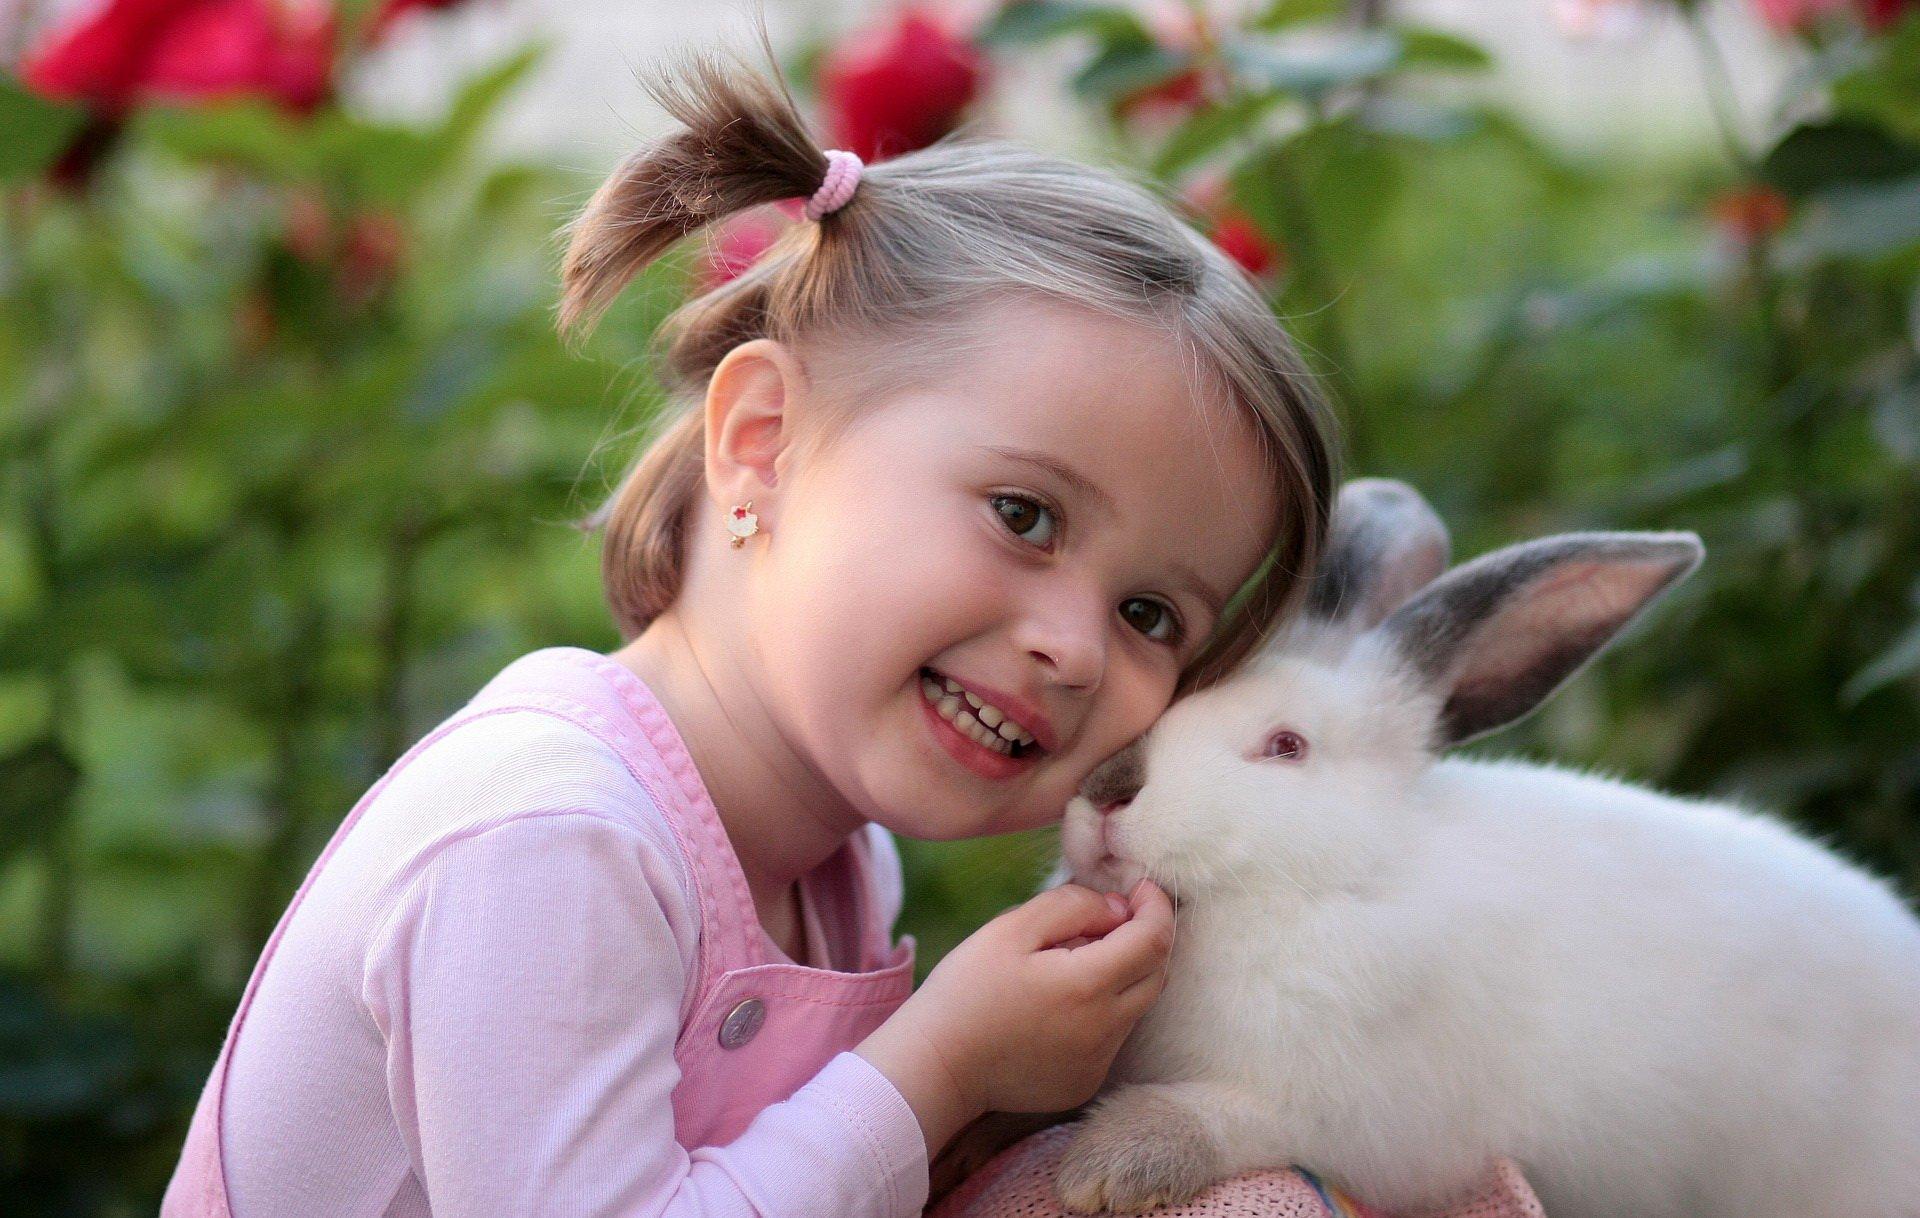 na omoc królikom, narysuj królika akcja